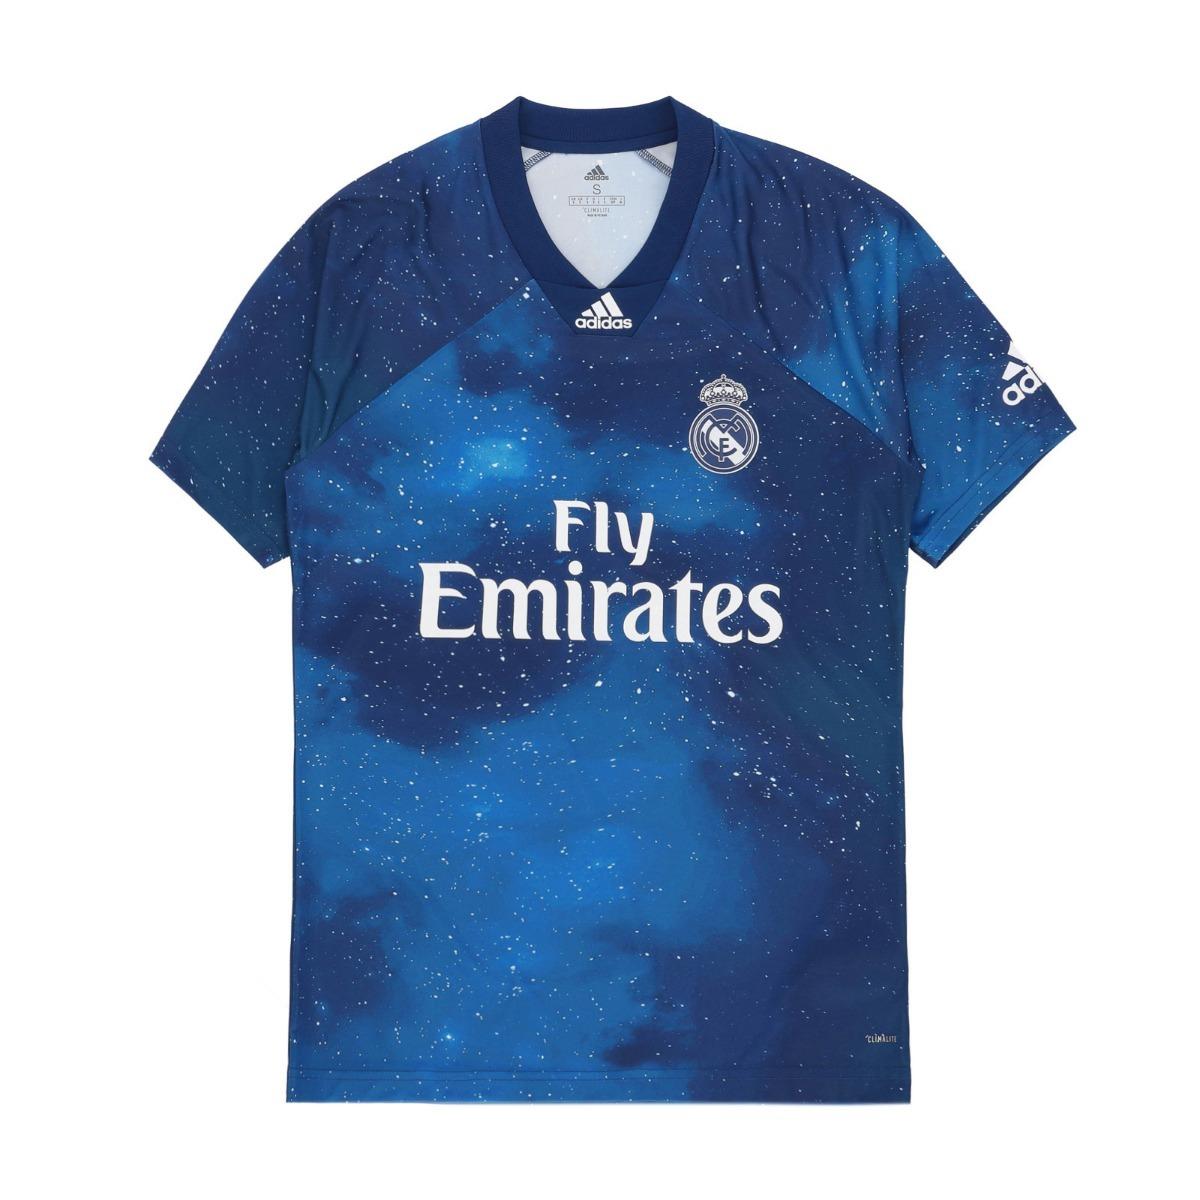 Camisa Real Madrid Ea Sports ( Pronta Entrega ) Prod. N bra - R  139 ... ed5a799b5465f